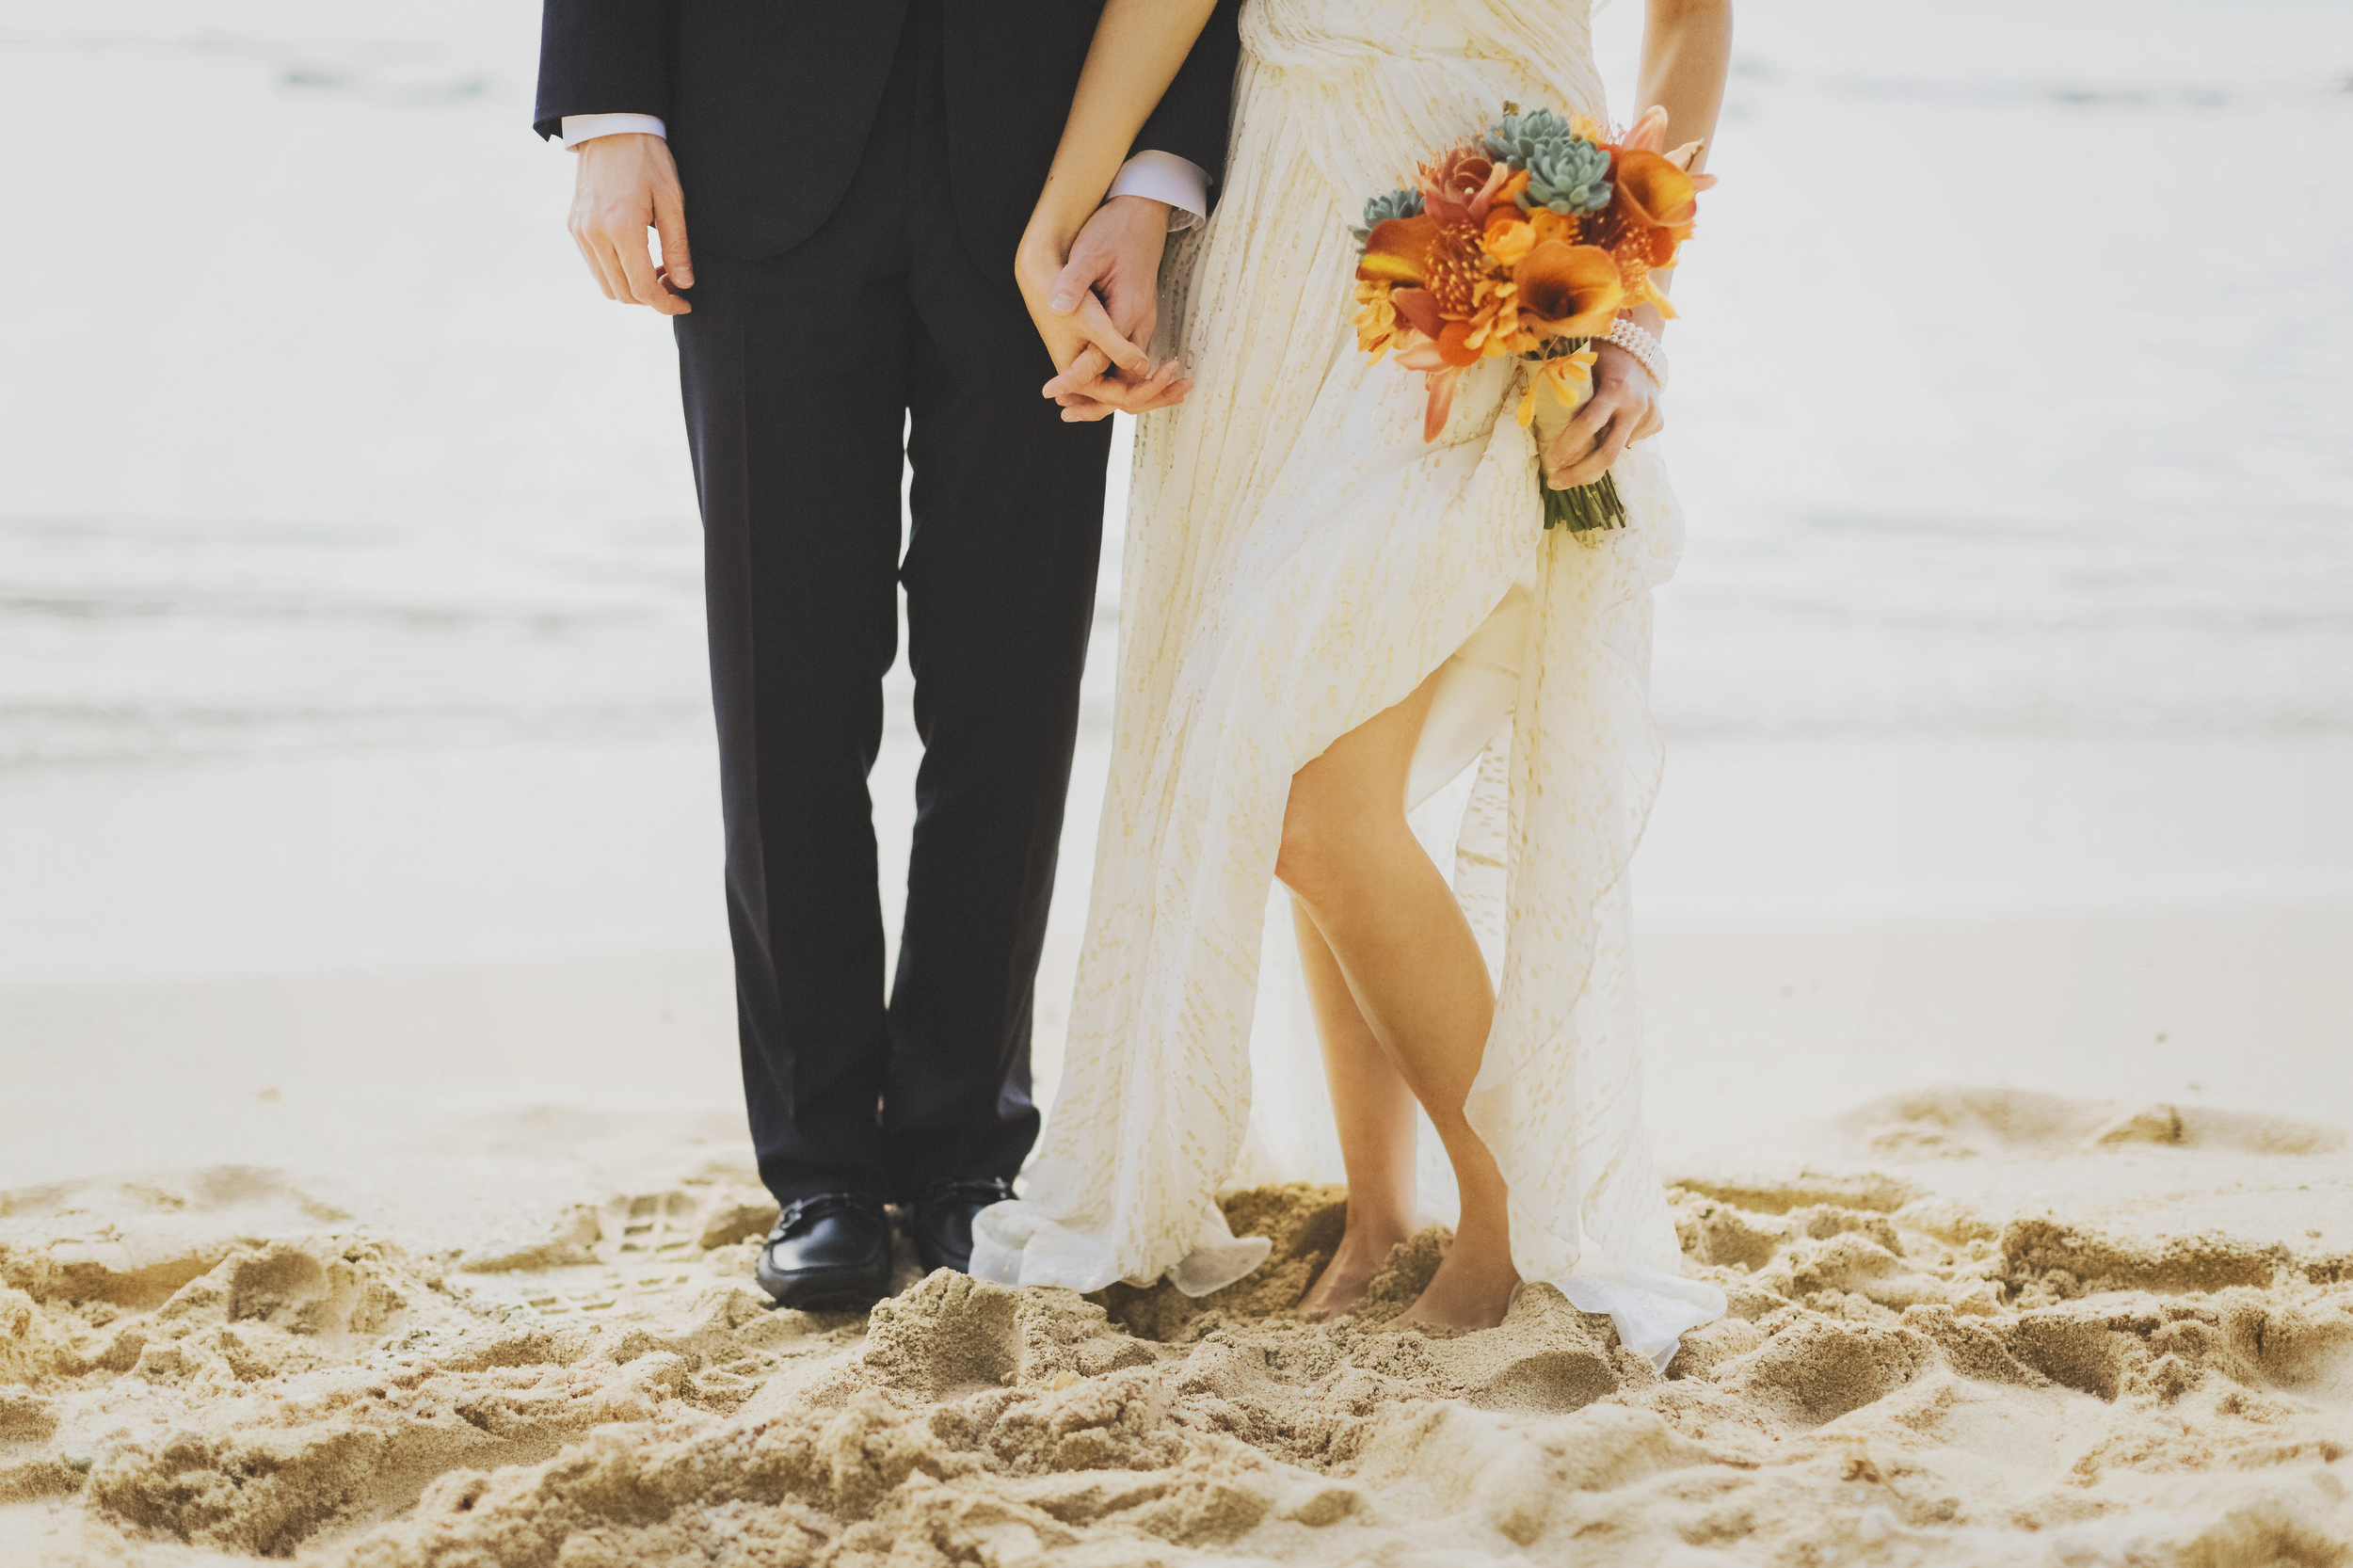 angie-diaz-photography-oahu-wedding-lanikuhonoa-shenshen-marshall-54.jpg